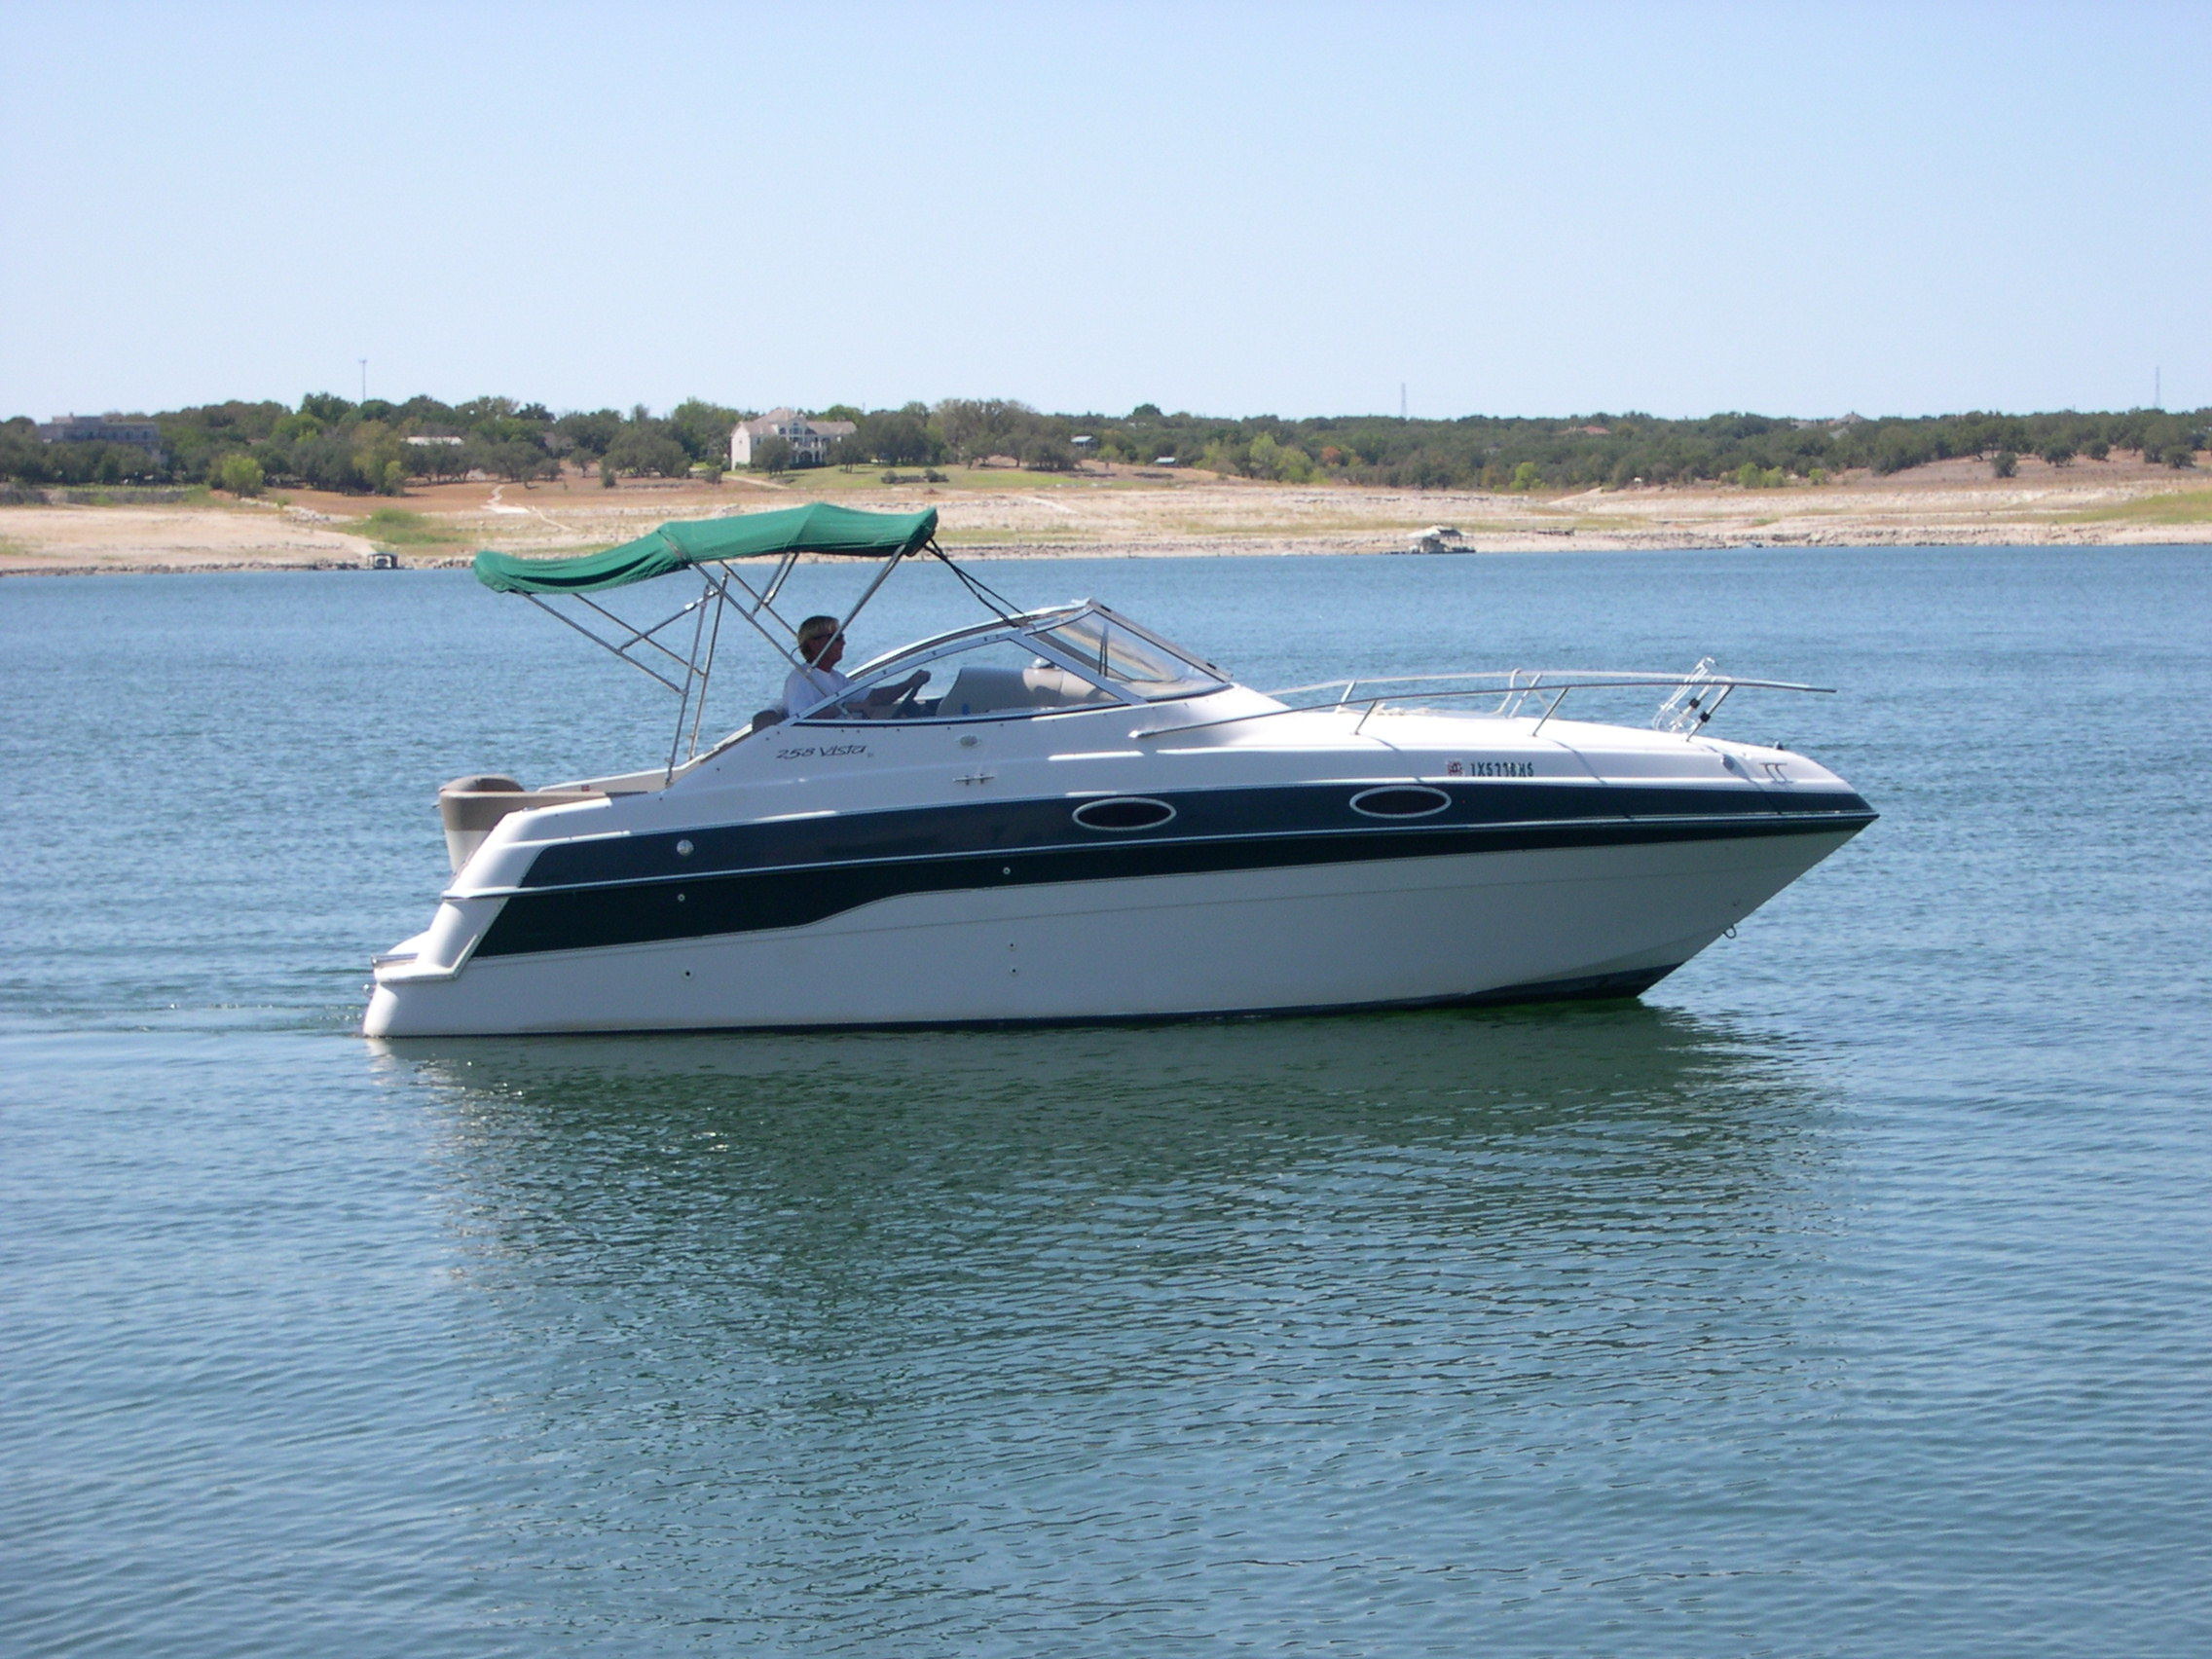 Boats For Sale Vip Marina Lake Travis Boat Brokerage